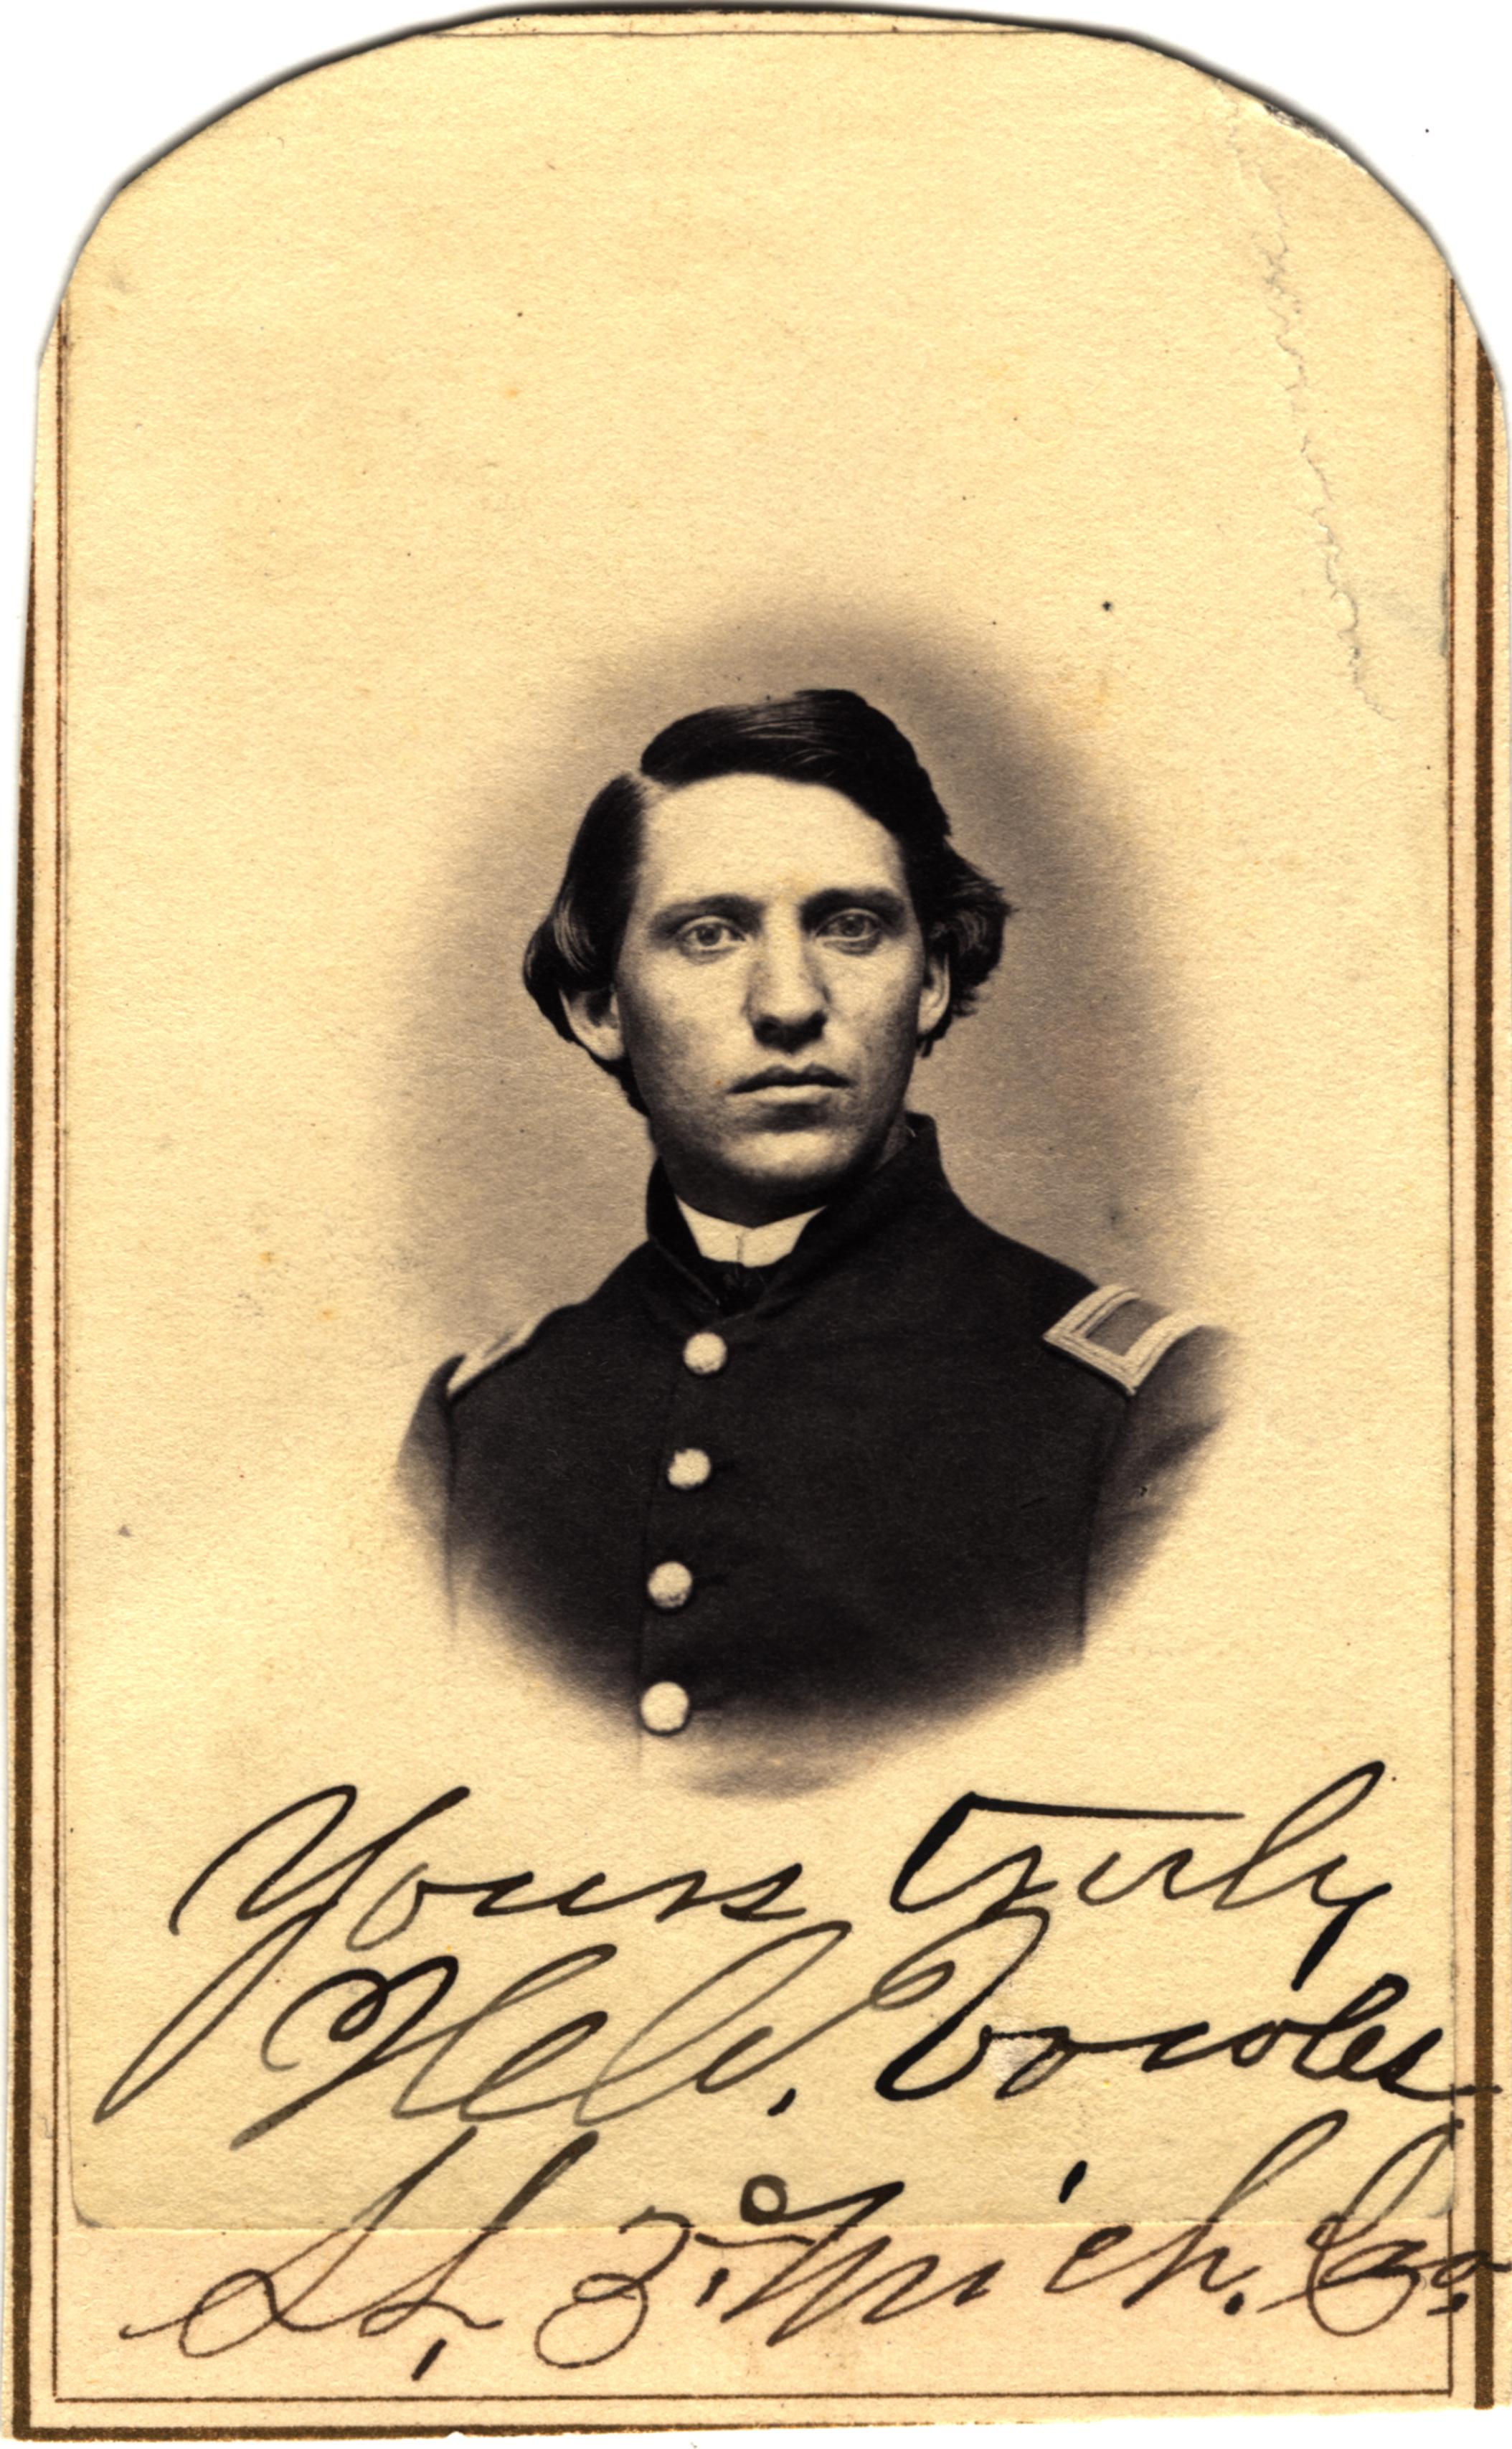 Henry C. Vowles, circa 1860s